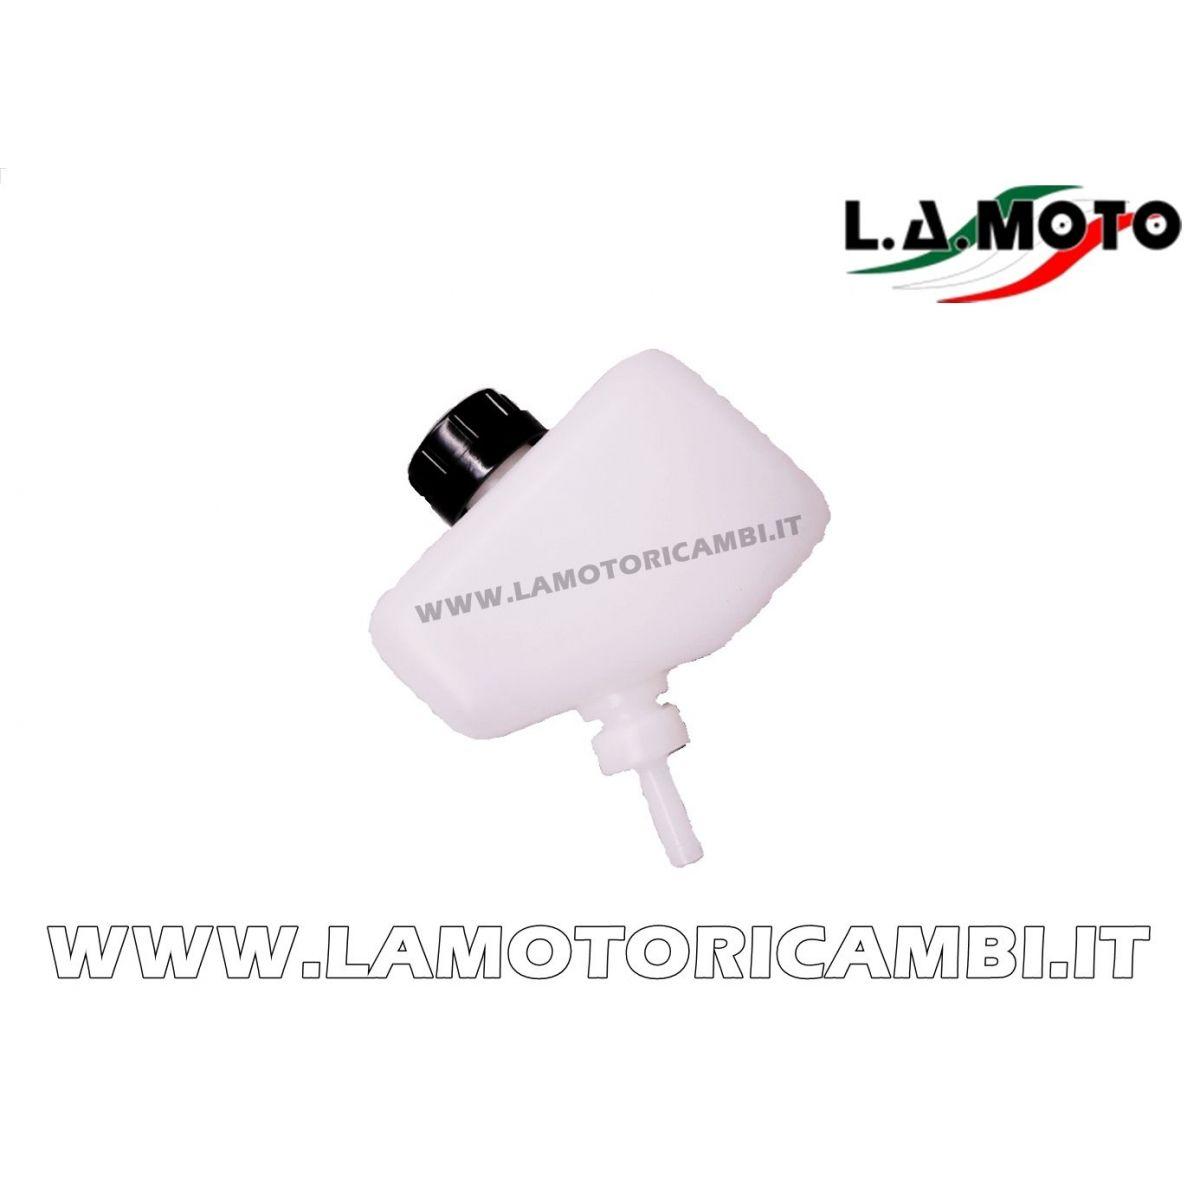 SERBATOIO OLIO FRENI PER APE MP-TM-CAR RIFERIMENTO CODICE 126134